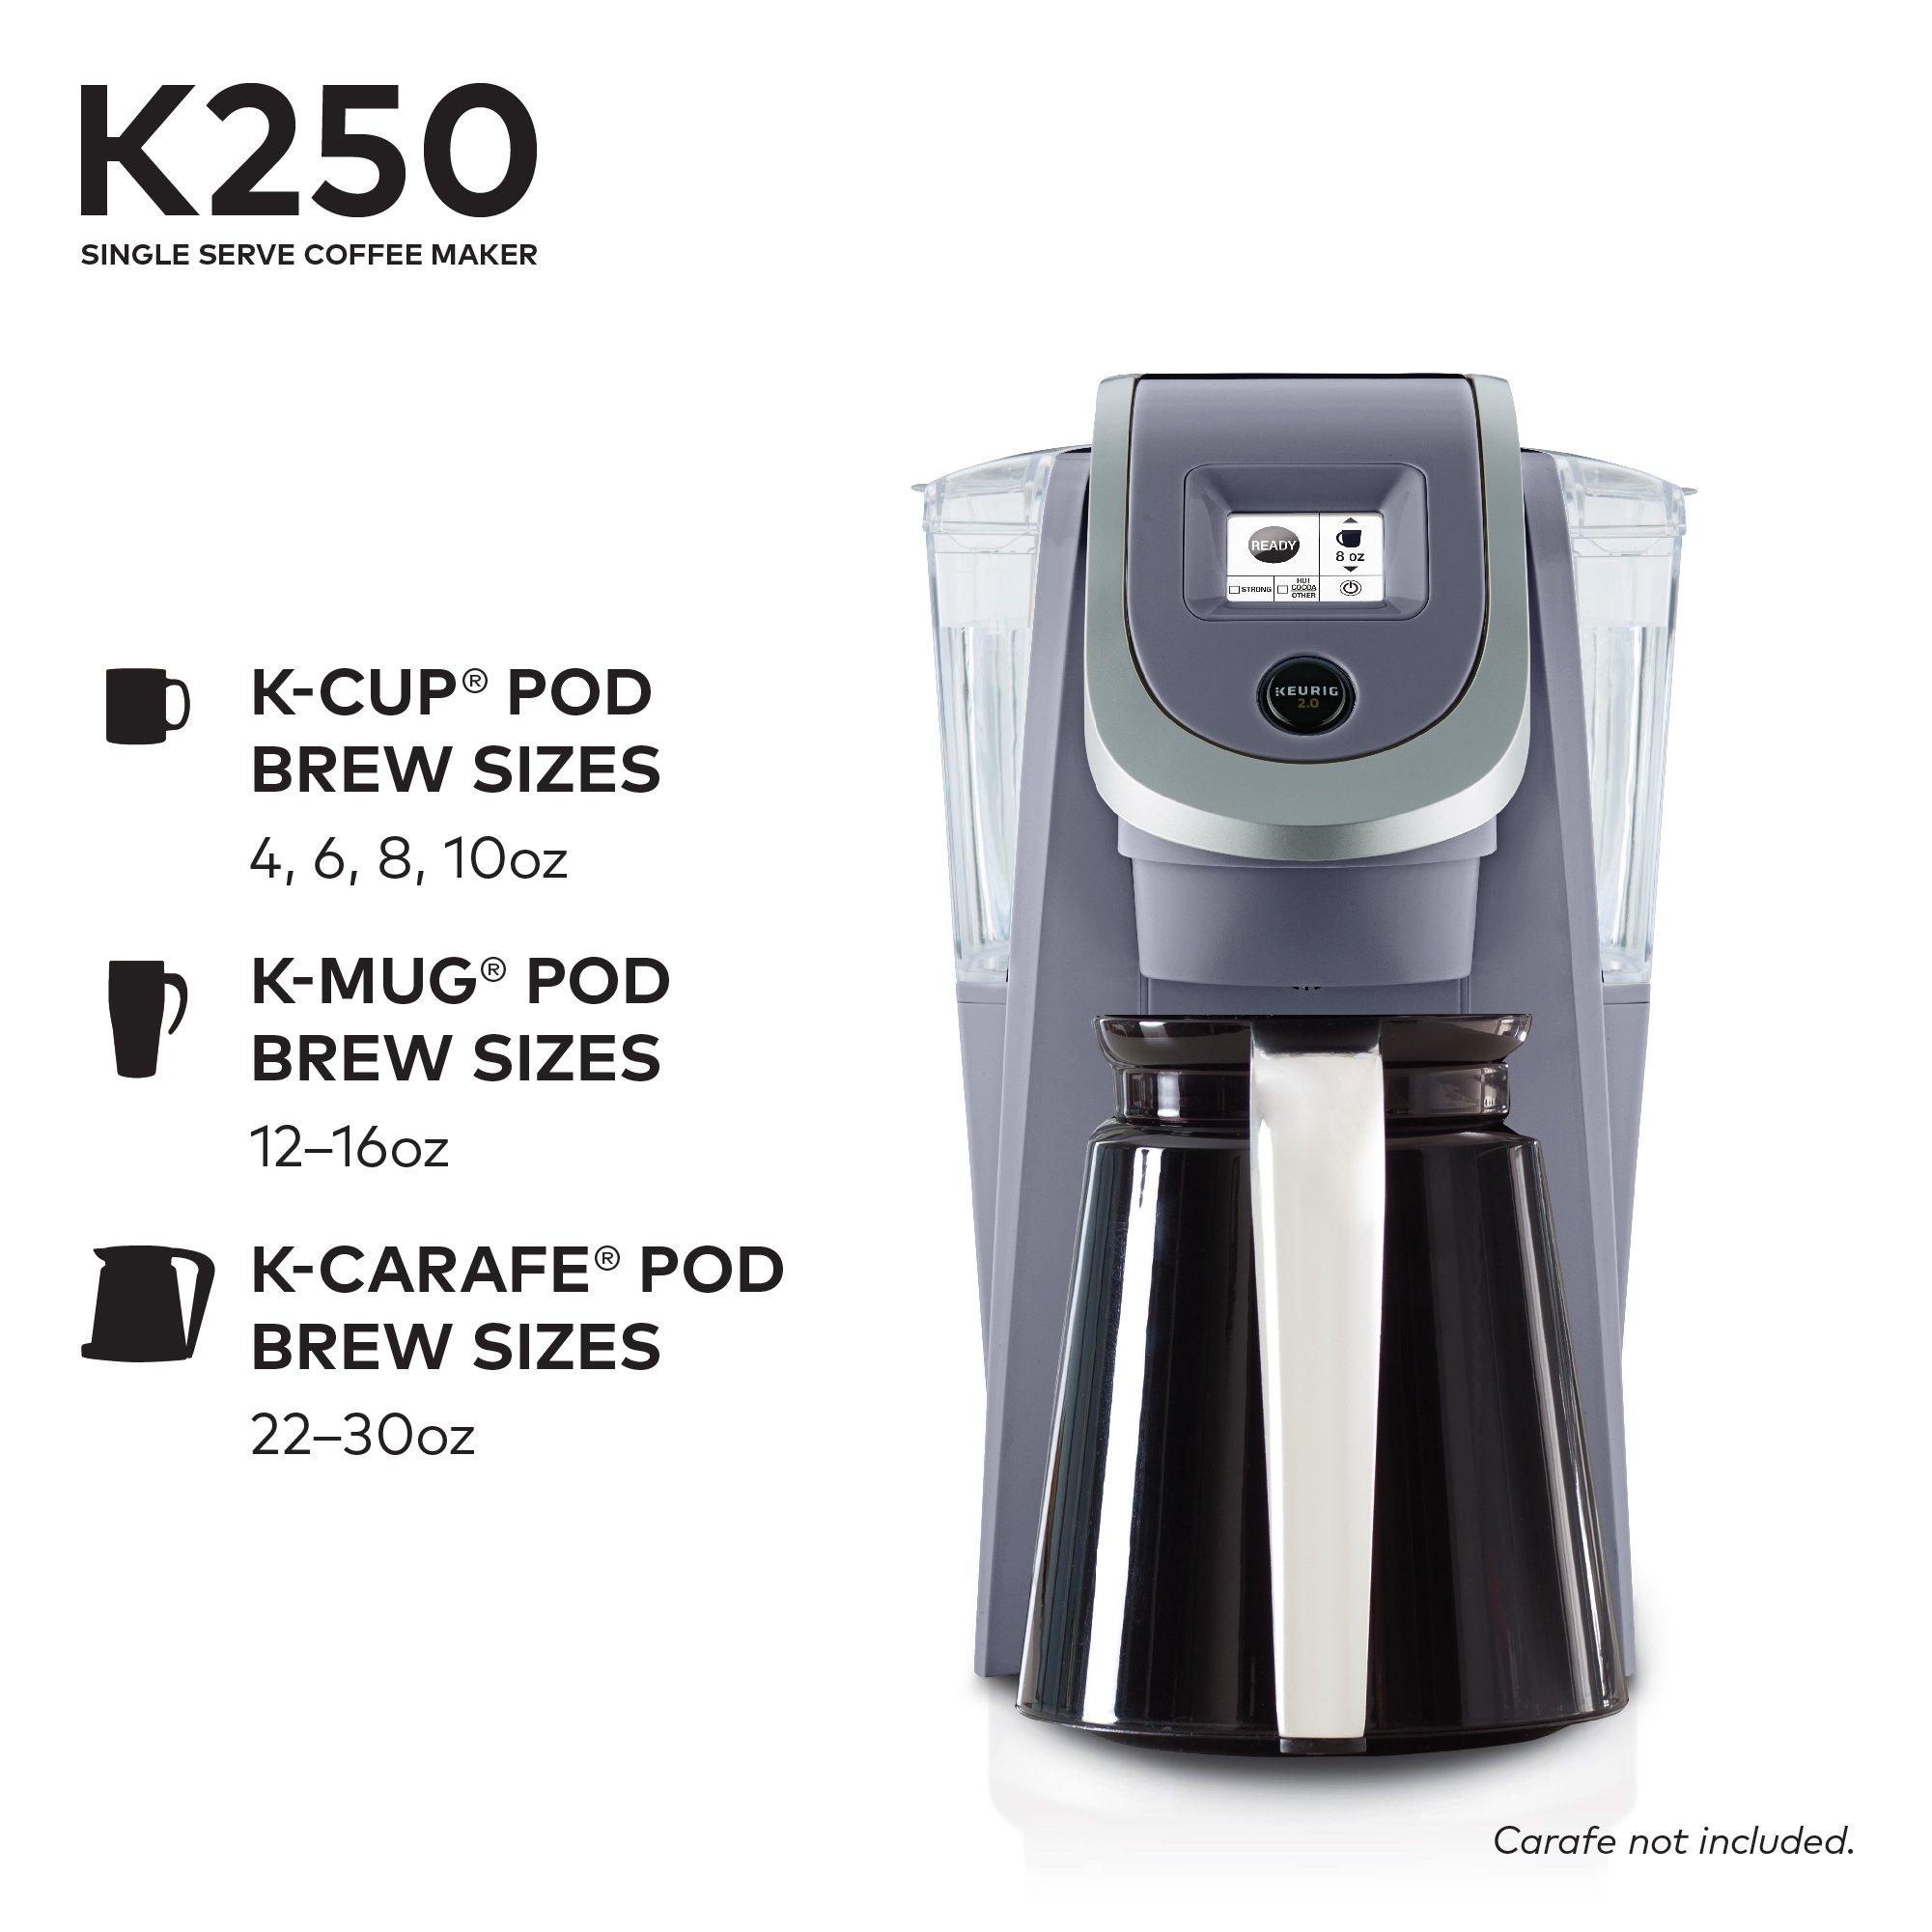 Keurig K250 Single Serve K-Cup Pod Coffee Maker with Strength Control Plum Grey Plum Grey by Keurig (Image #4)